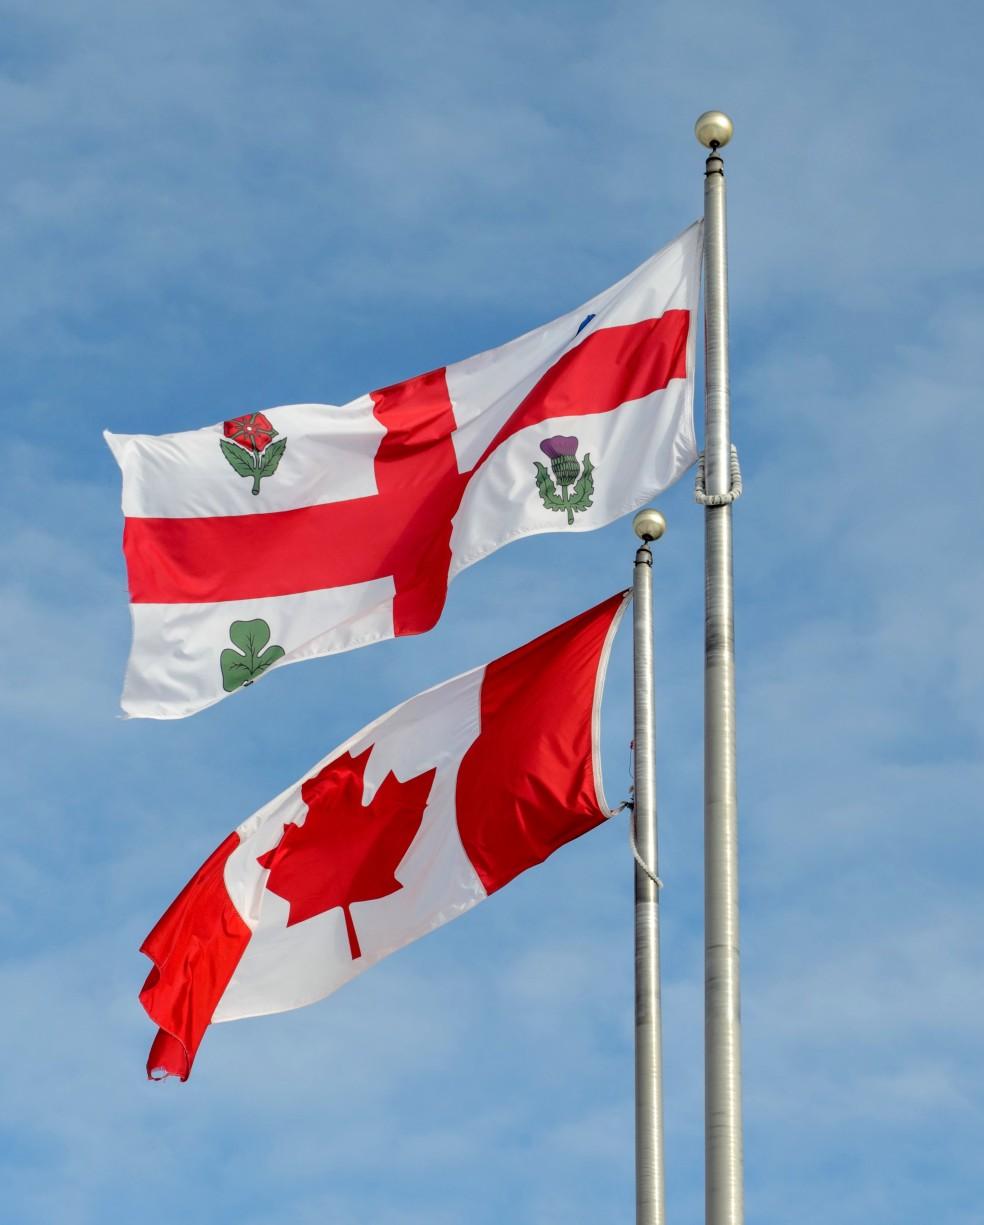 Bandiere Canadese e del Quebec